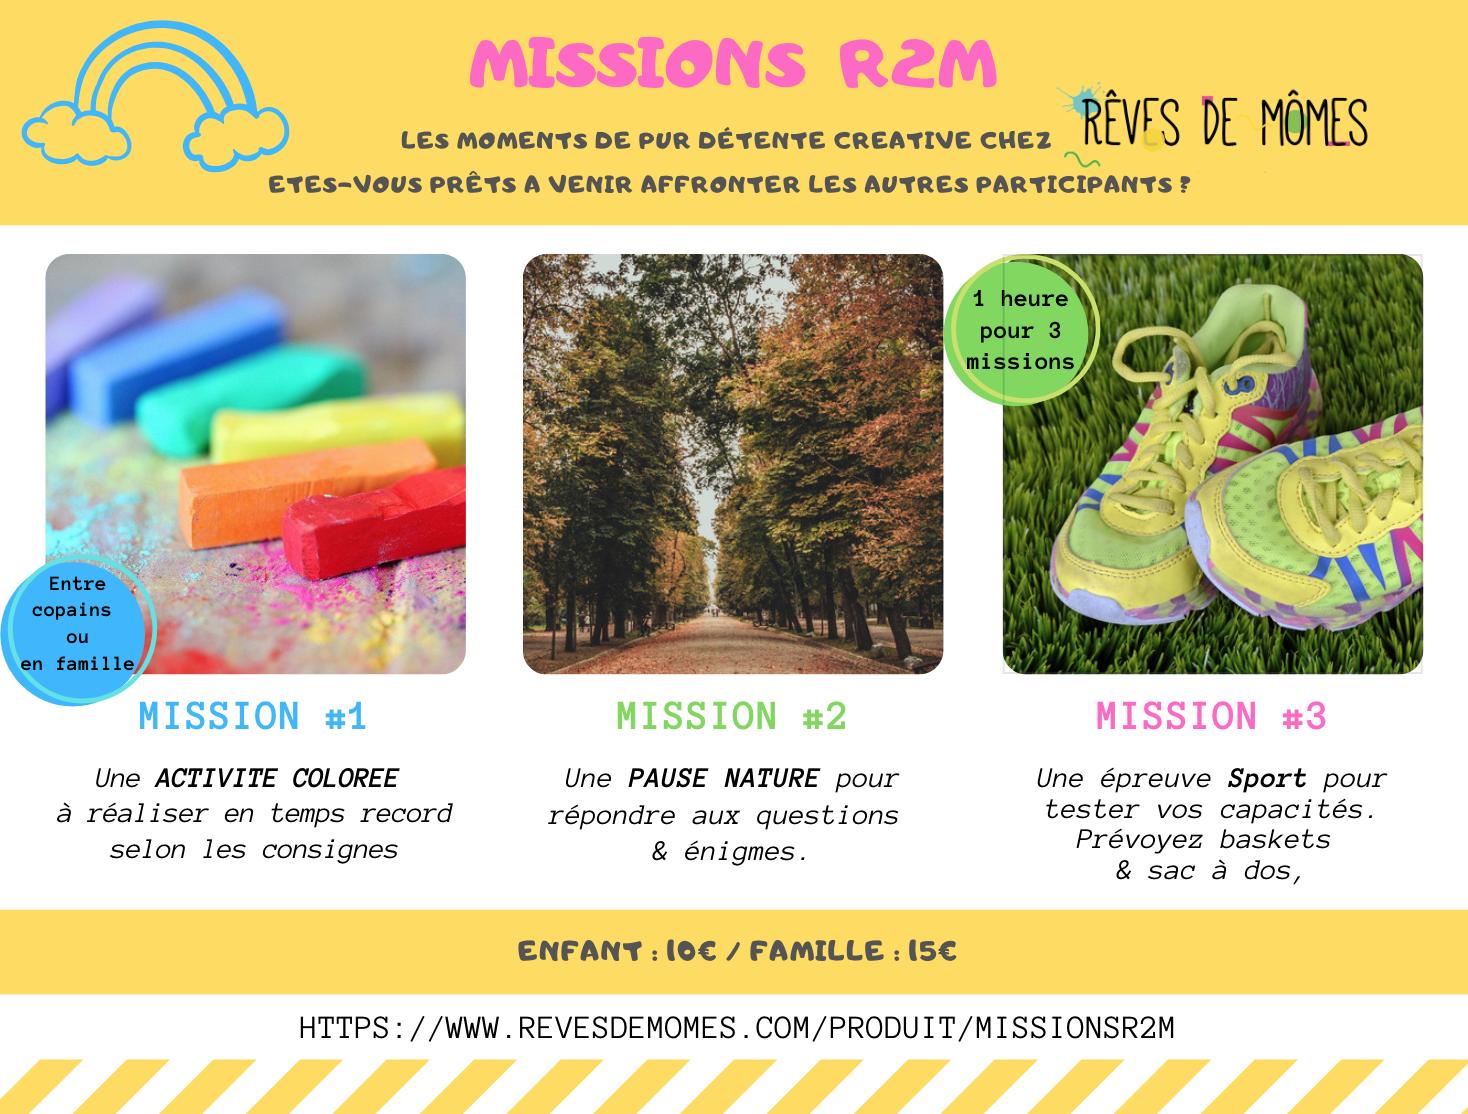 missionsr2m